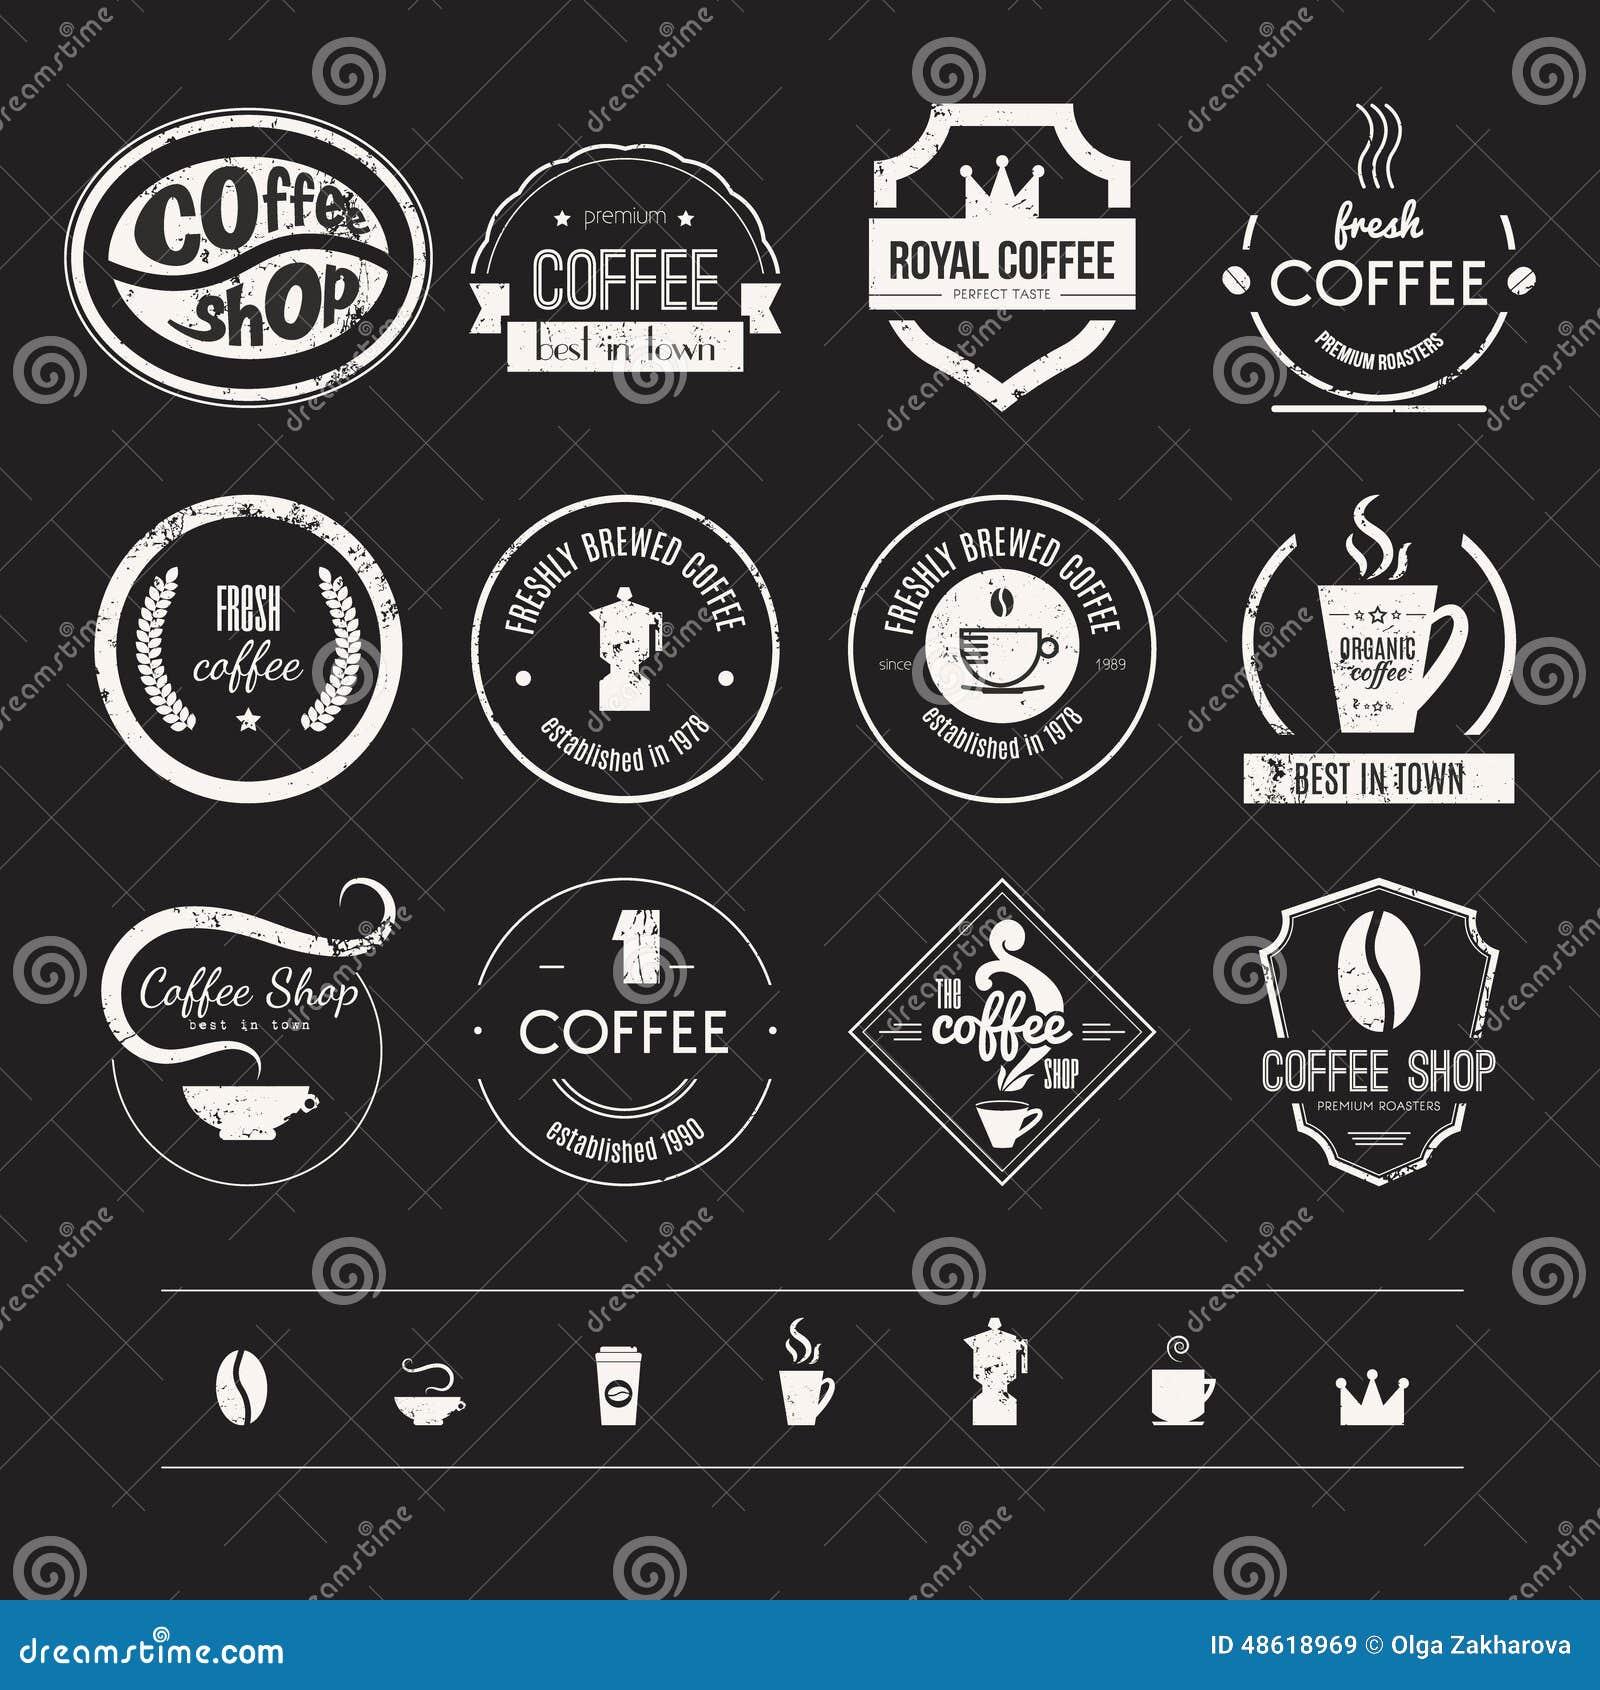 Modern coffee shop logos gallery